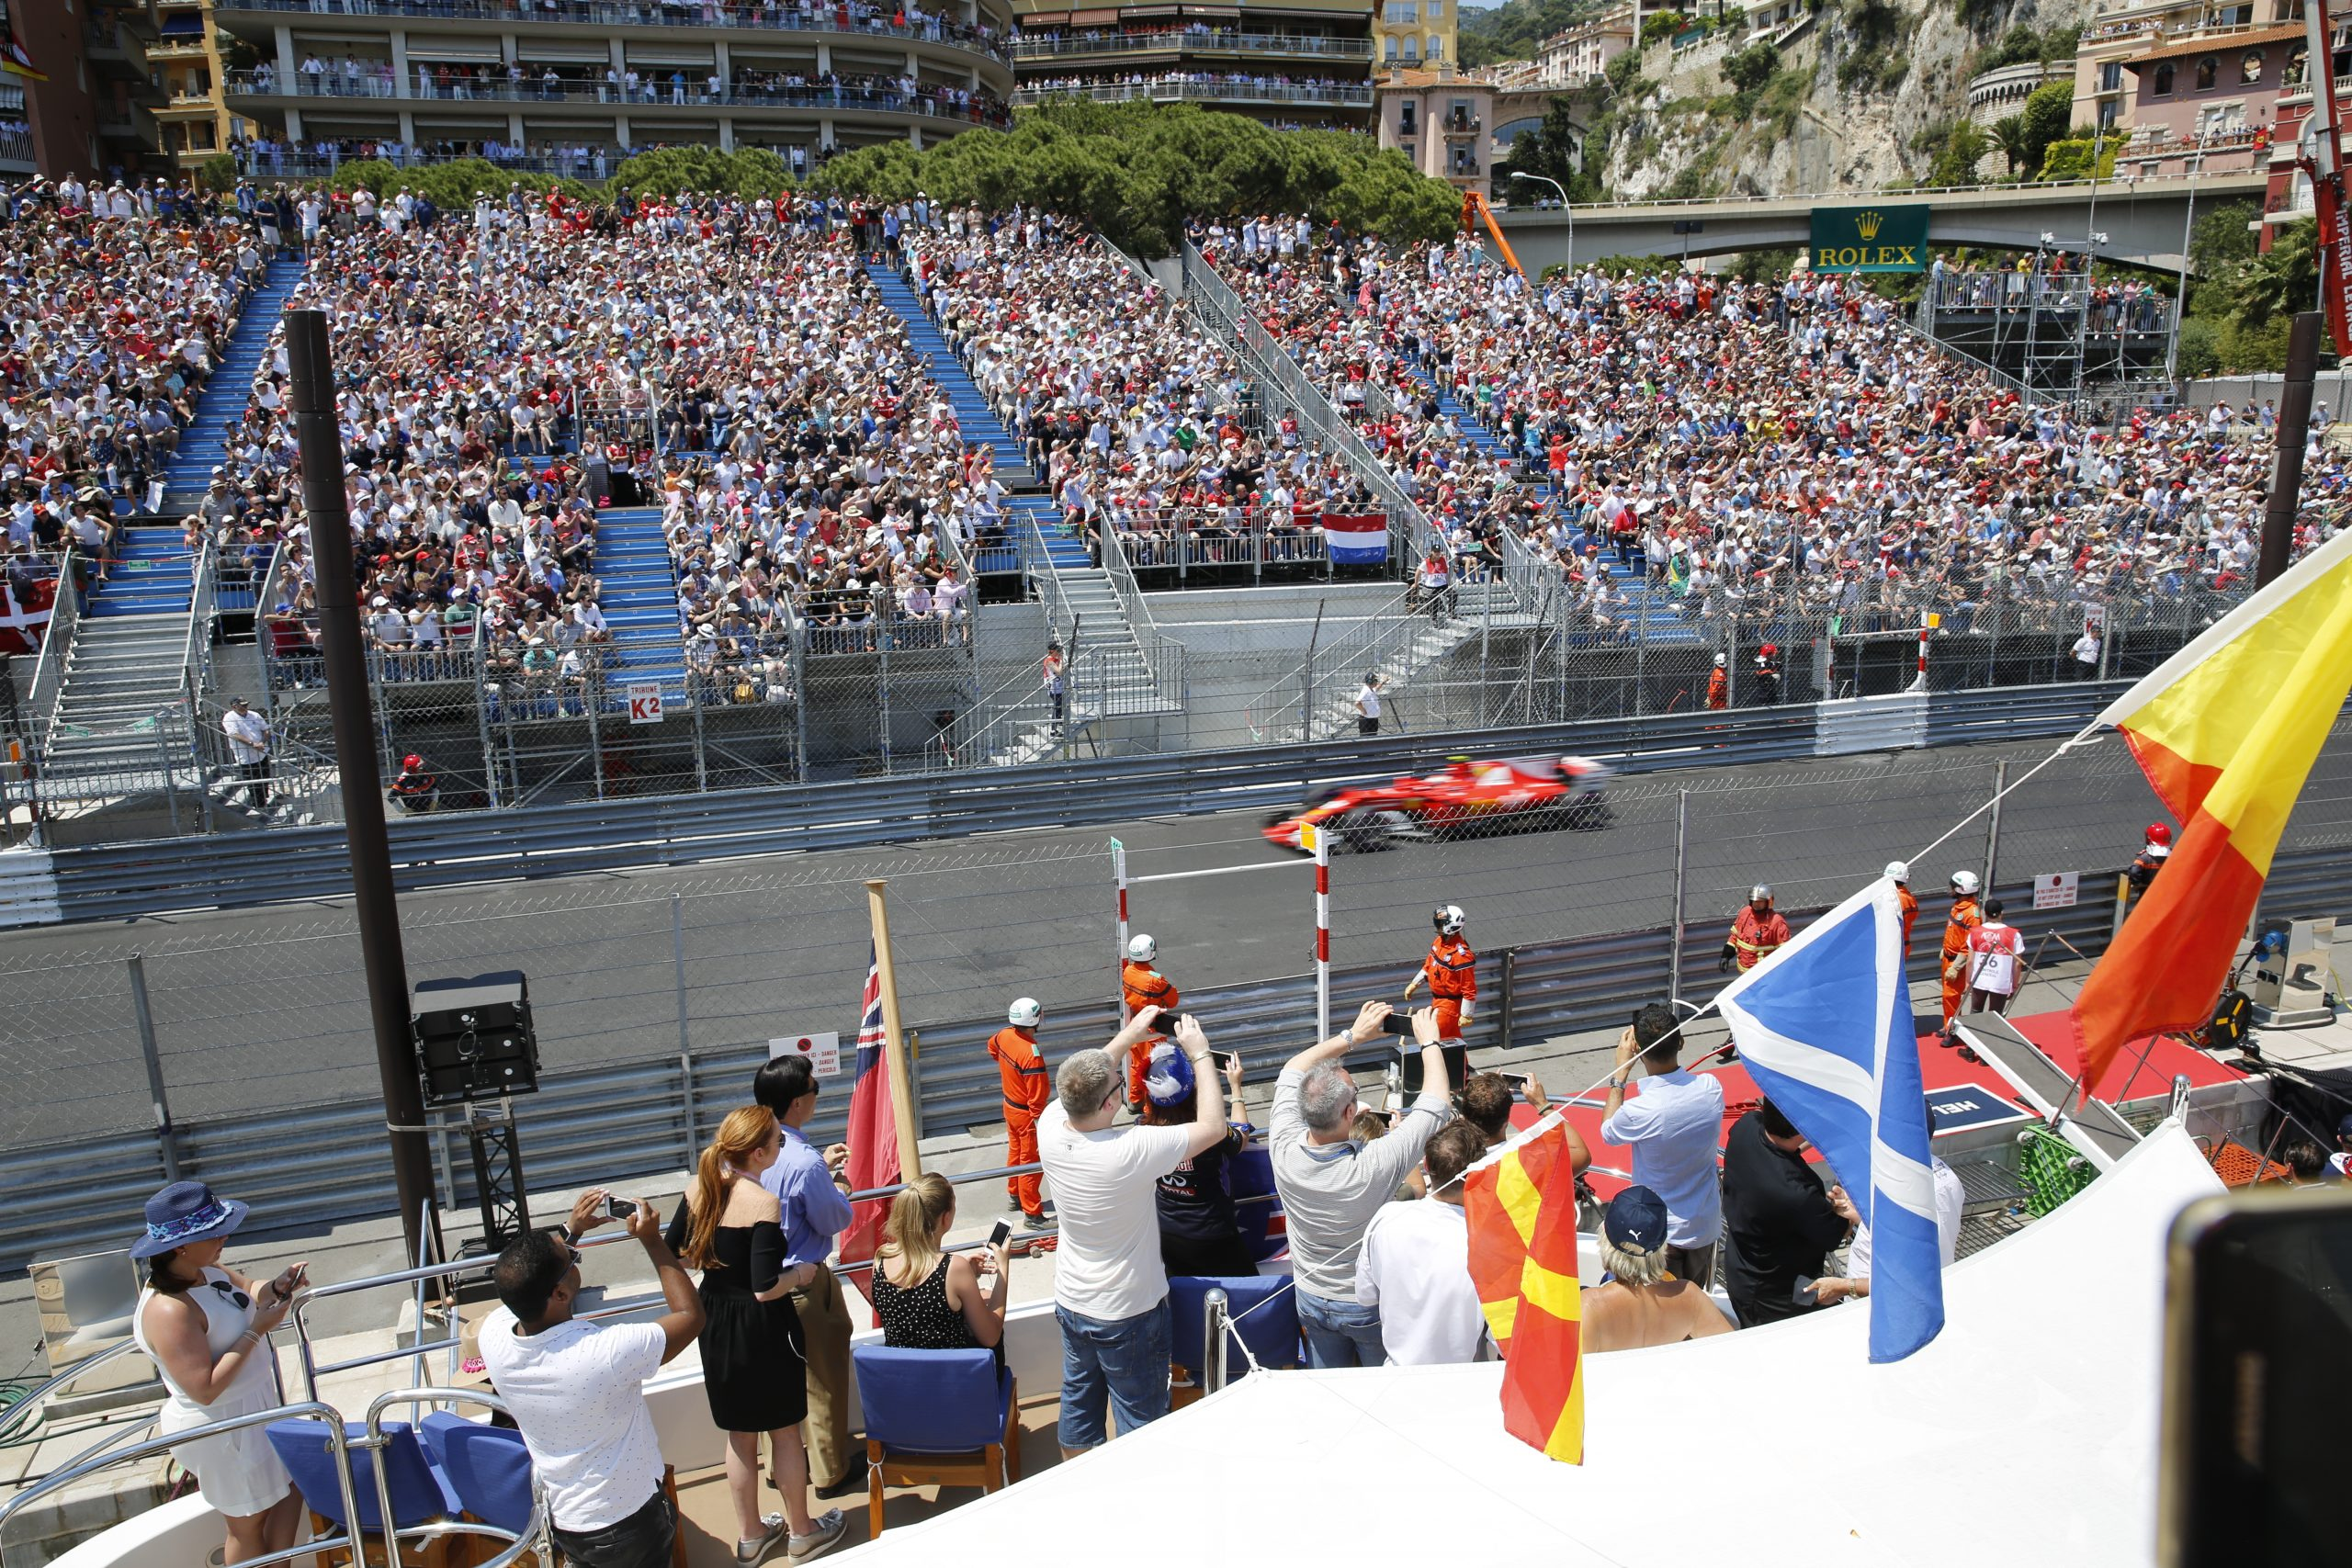 Amber Lounge Jacht Hospitality – Formule 1 Monaco – Monte Carlo 2021